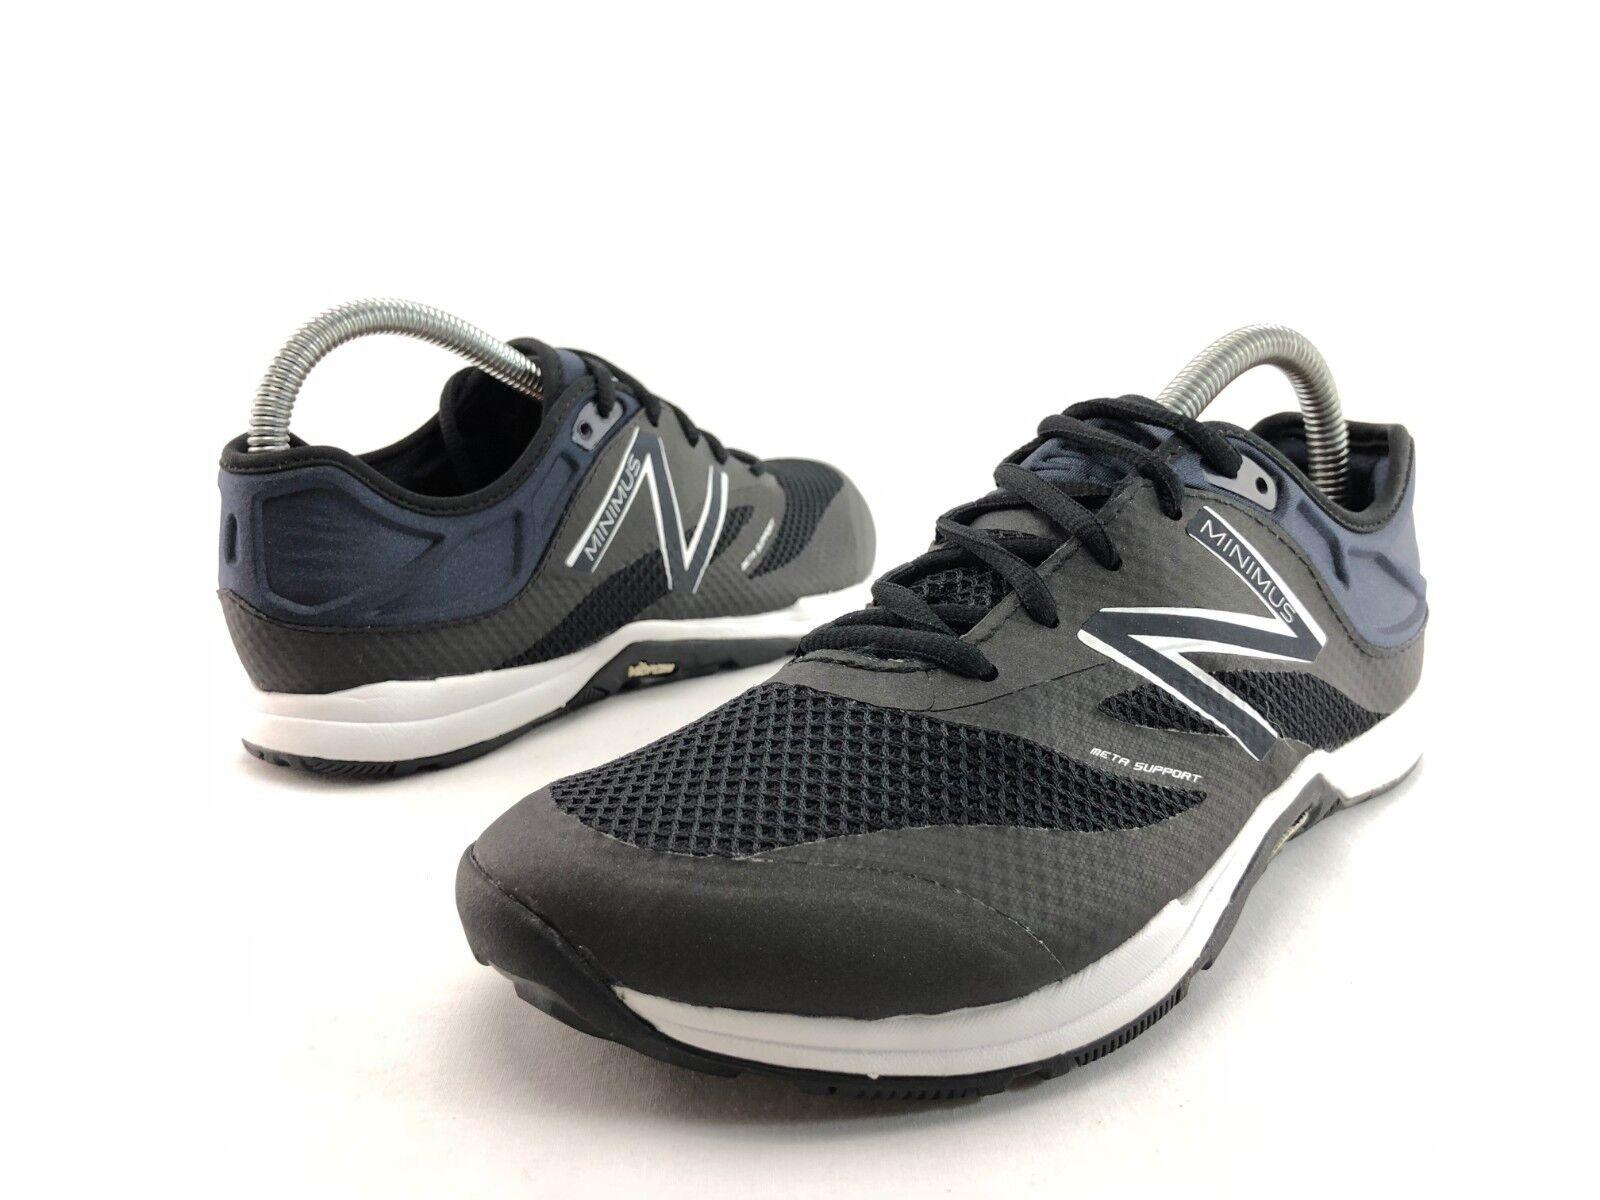 New Balance Minimus 20v7 Women's Black Running Trainer Sneakers US 7.5 D 196D